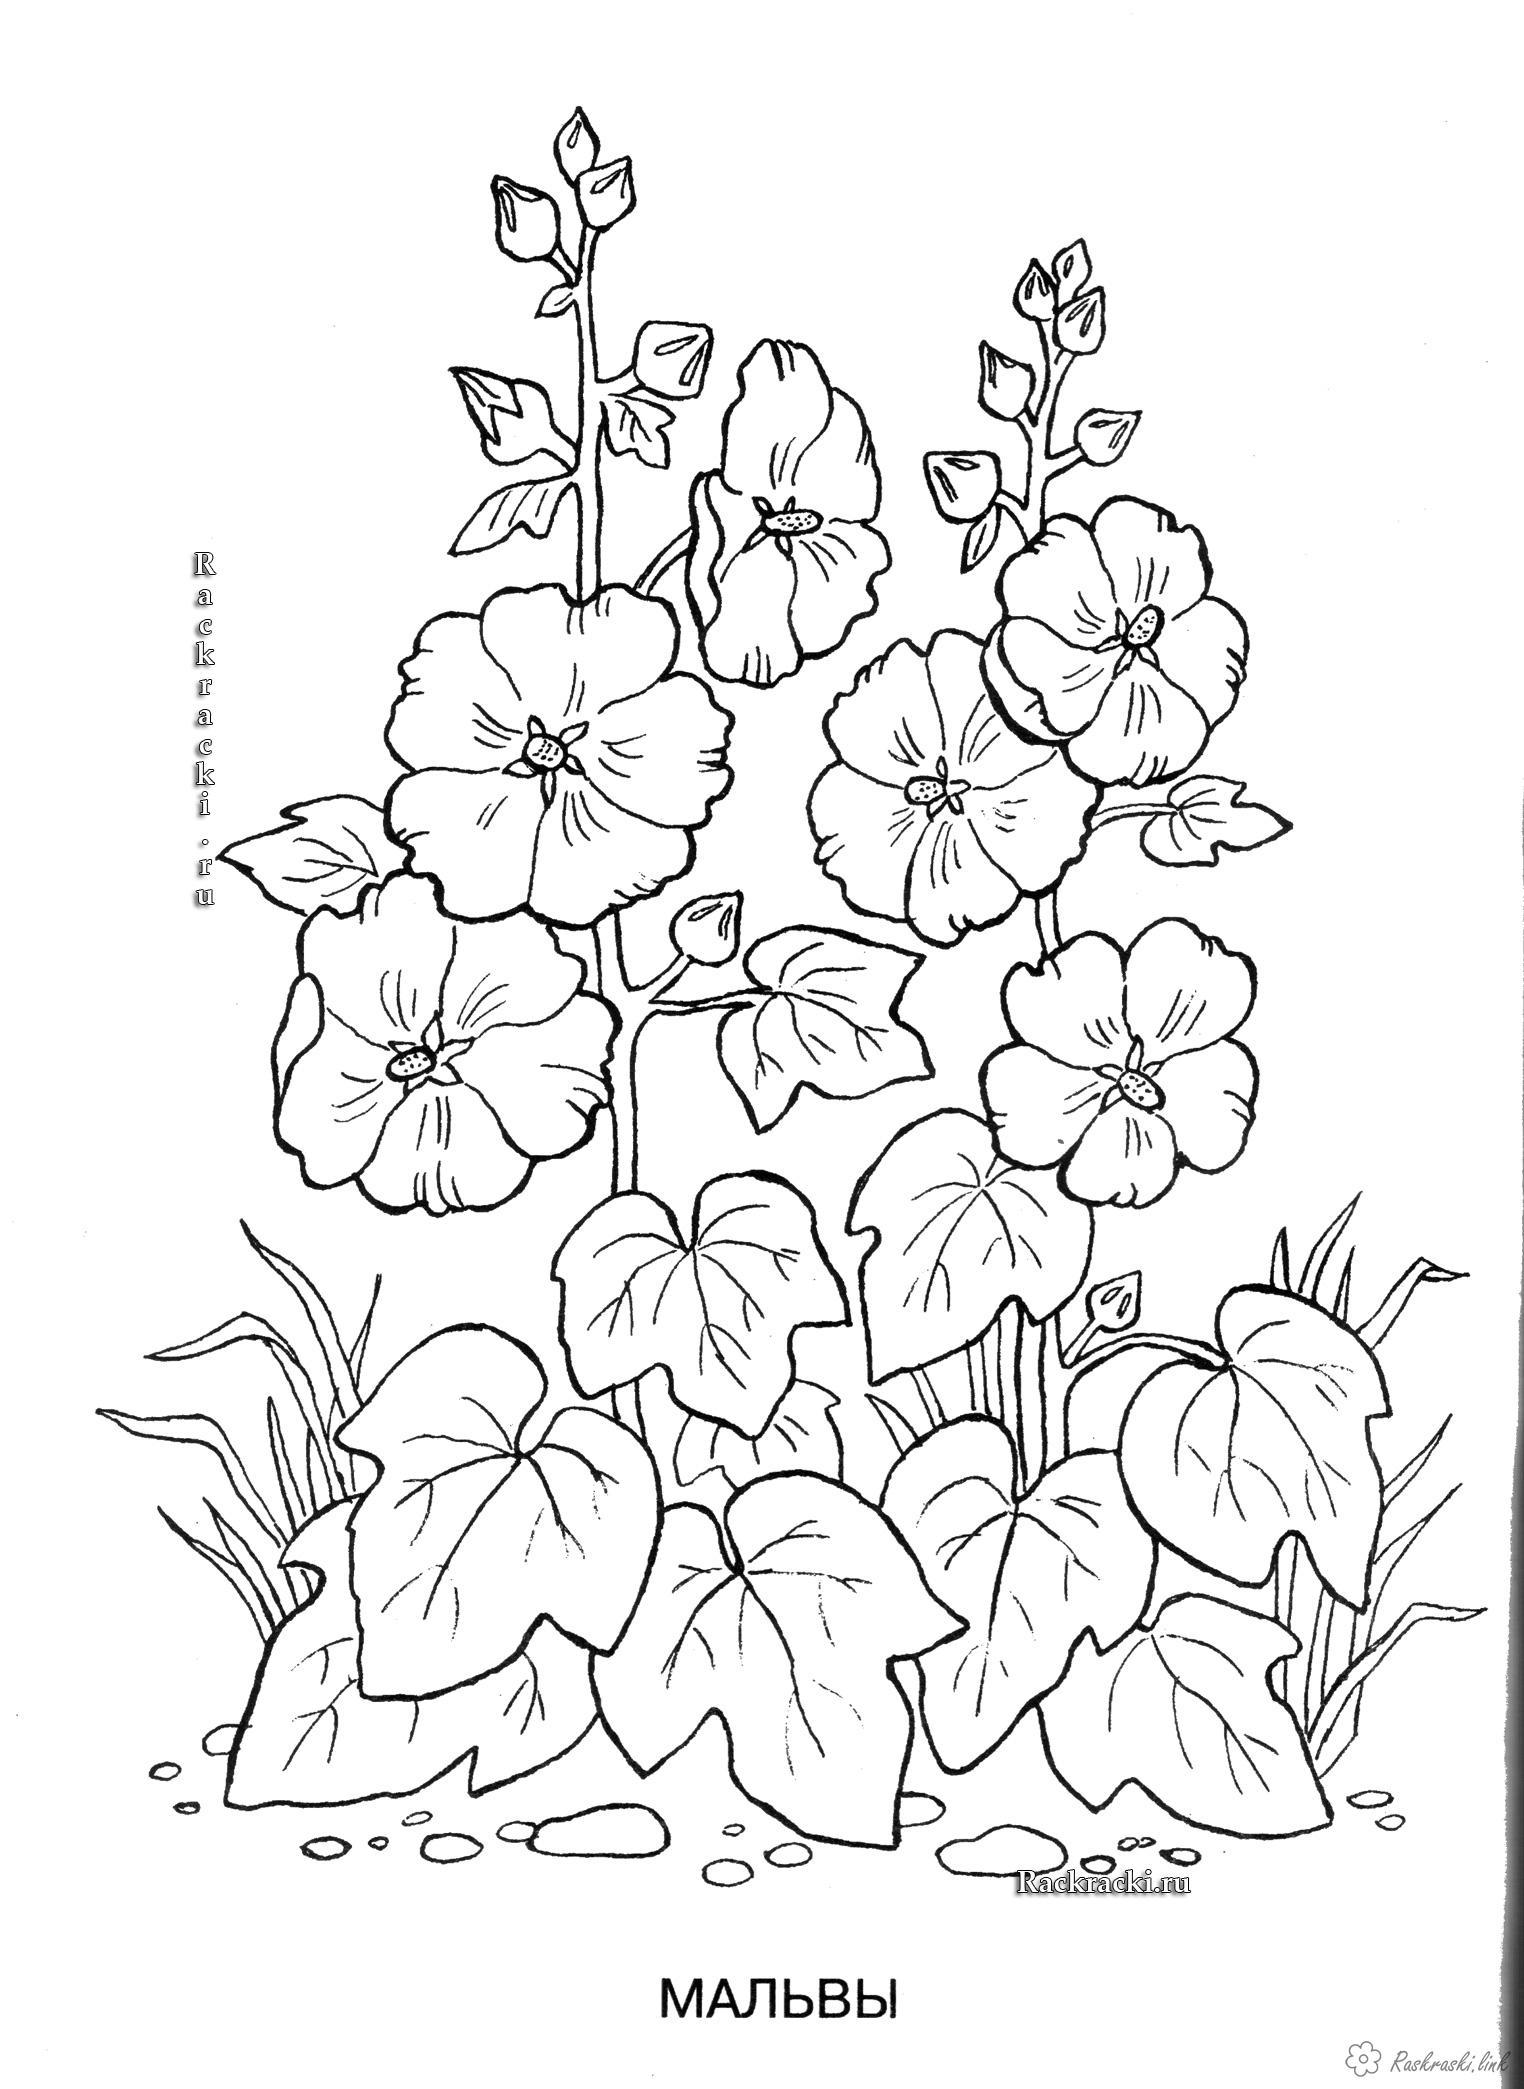 Coloring Plants coloring pages plants, nature, flowers